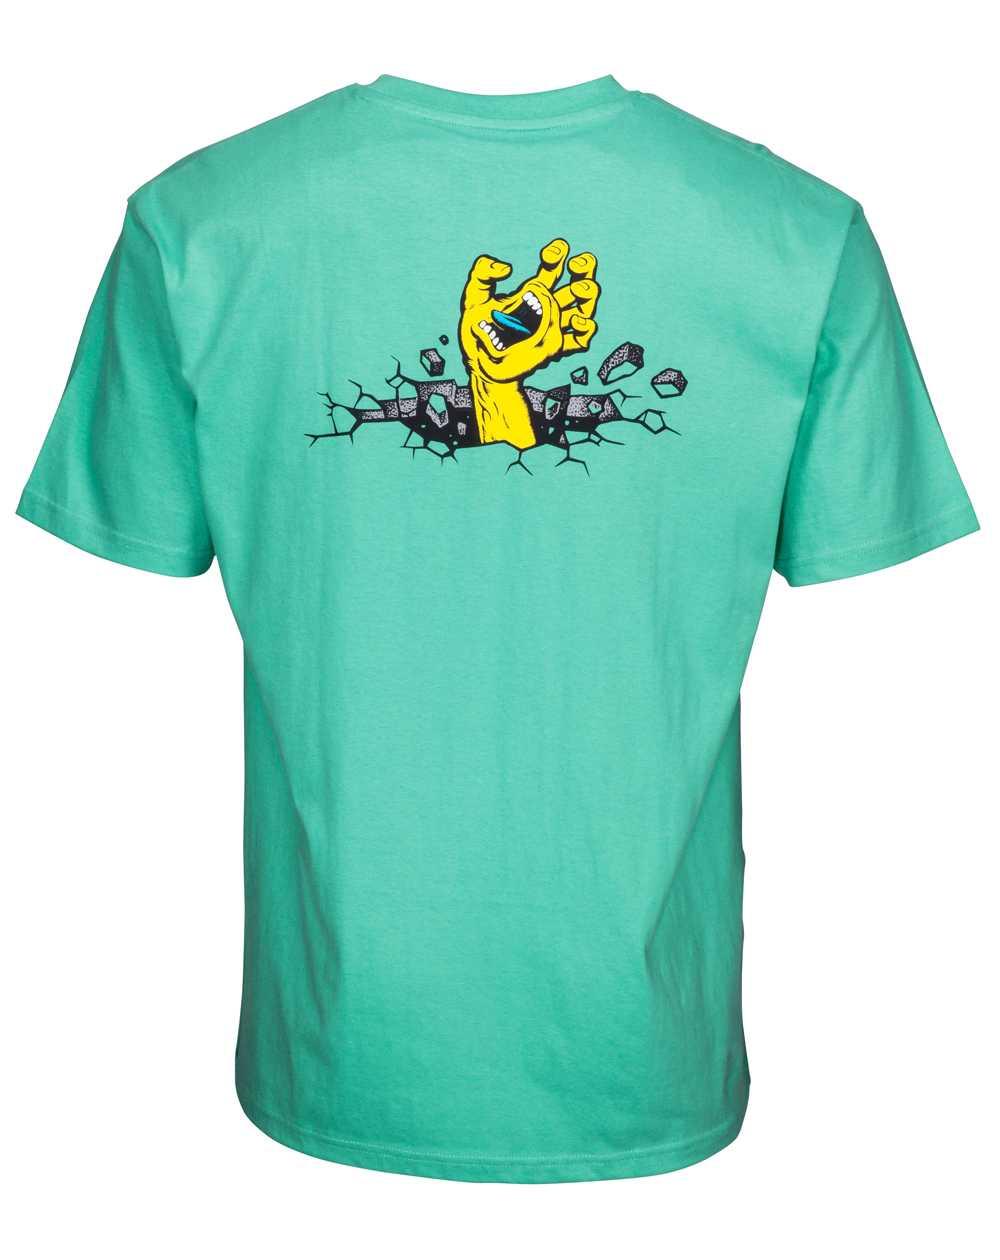 Santa Cruz Men's T-Shirt Hand Wall Spearmint